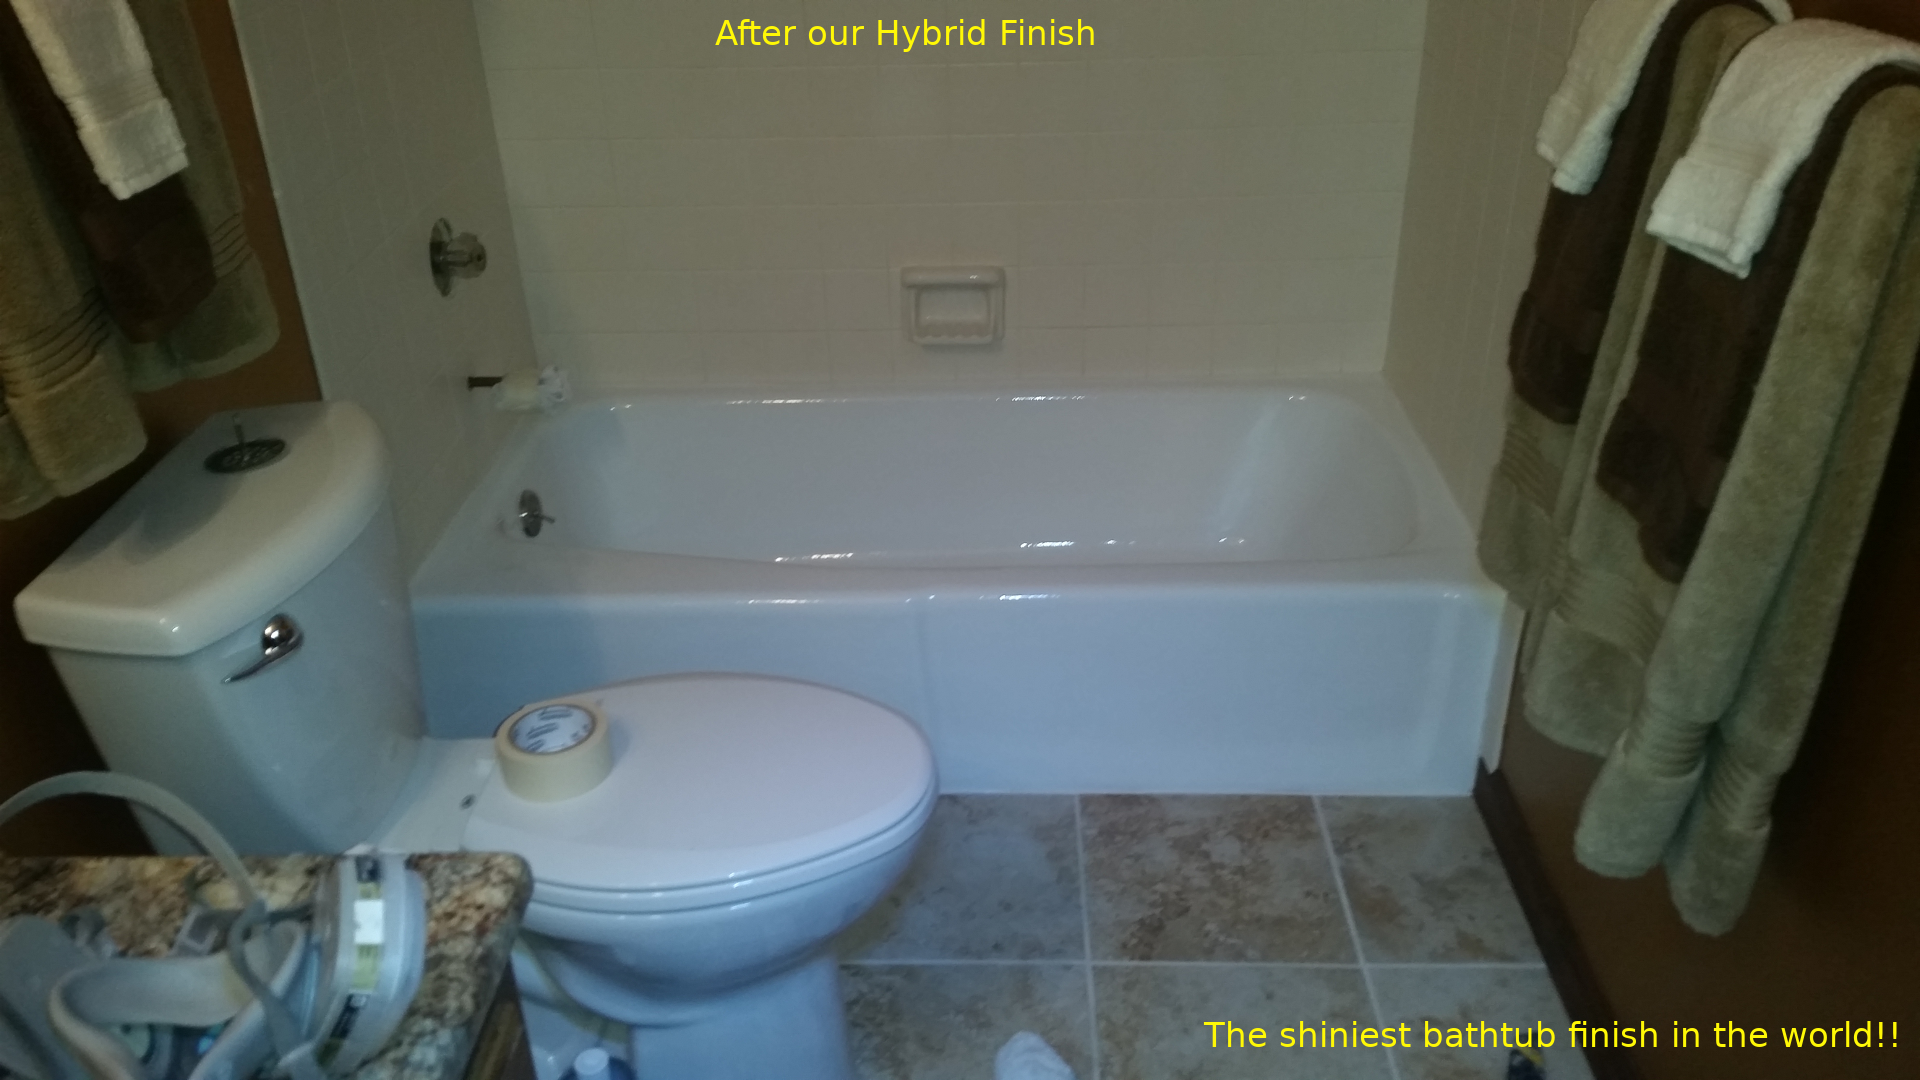 Best Bathtub Refinish, Resurface, Re-glaze and Remodel